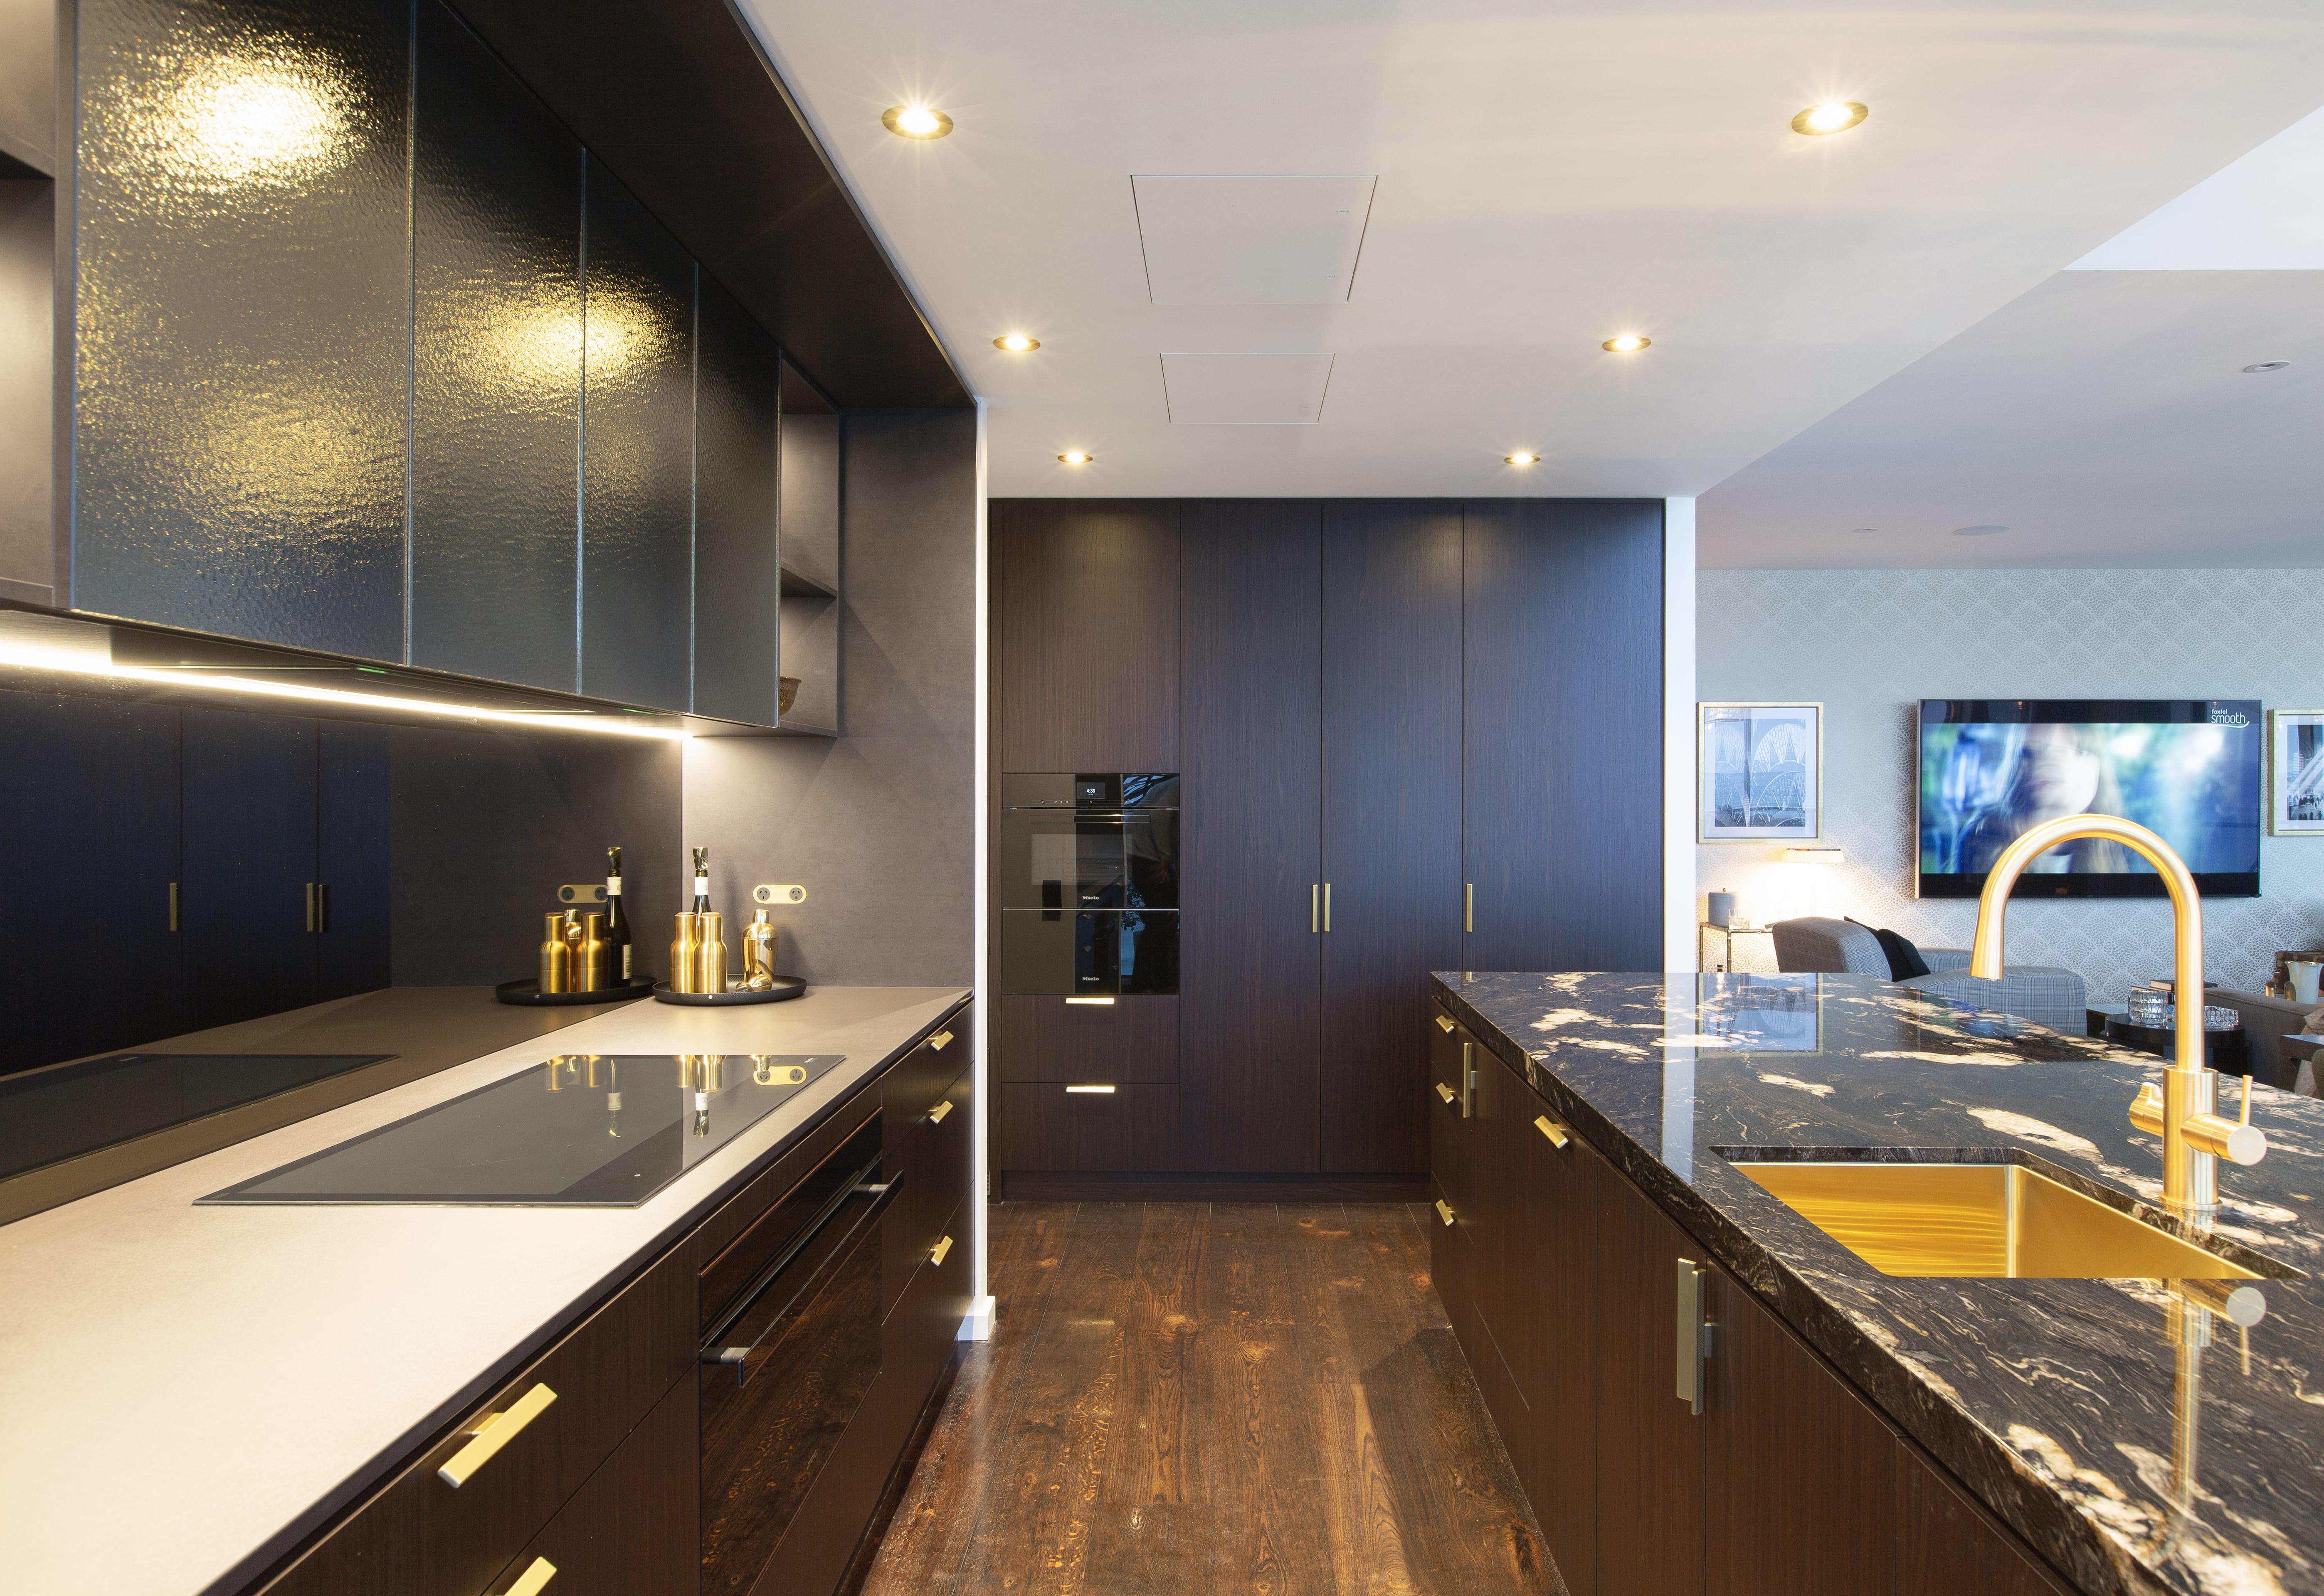 Galley View of Kitchen